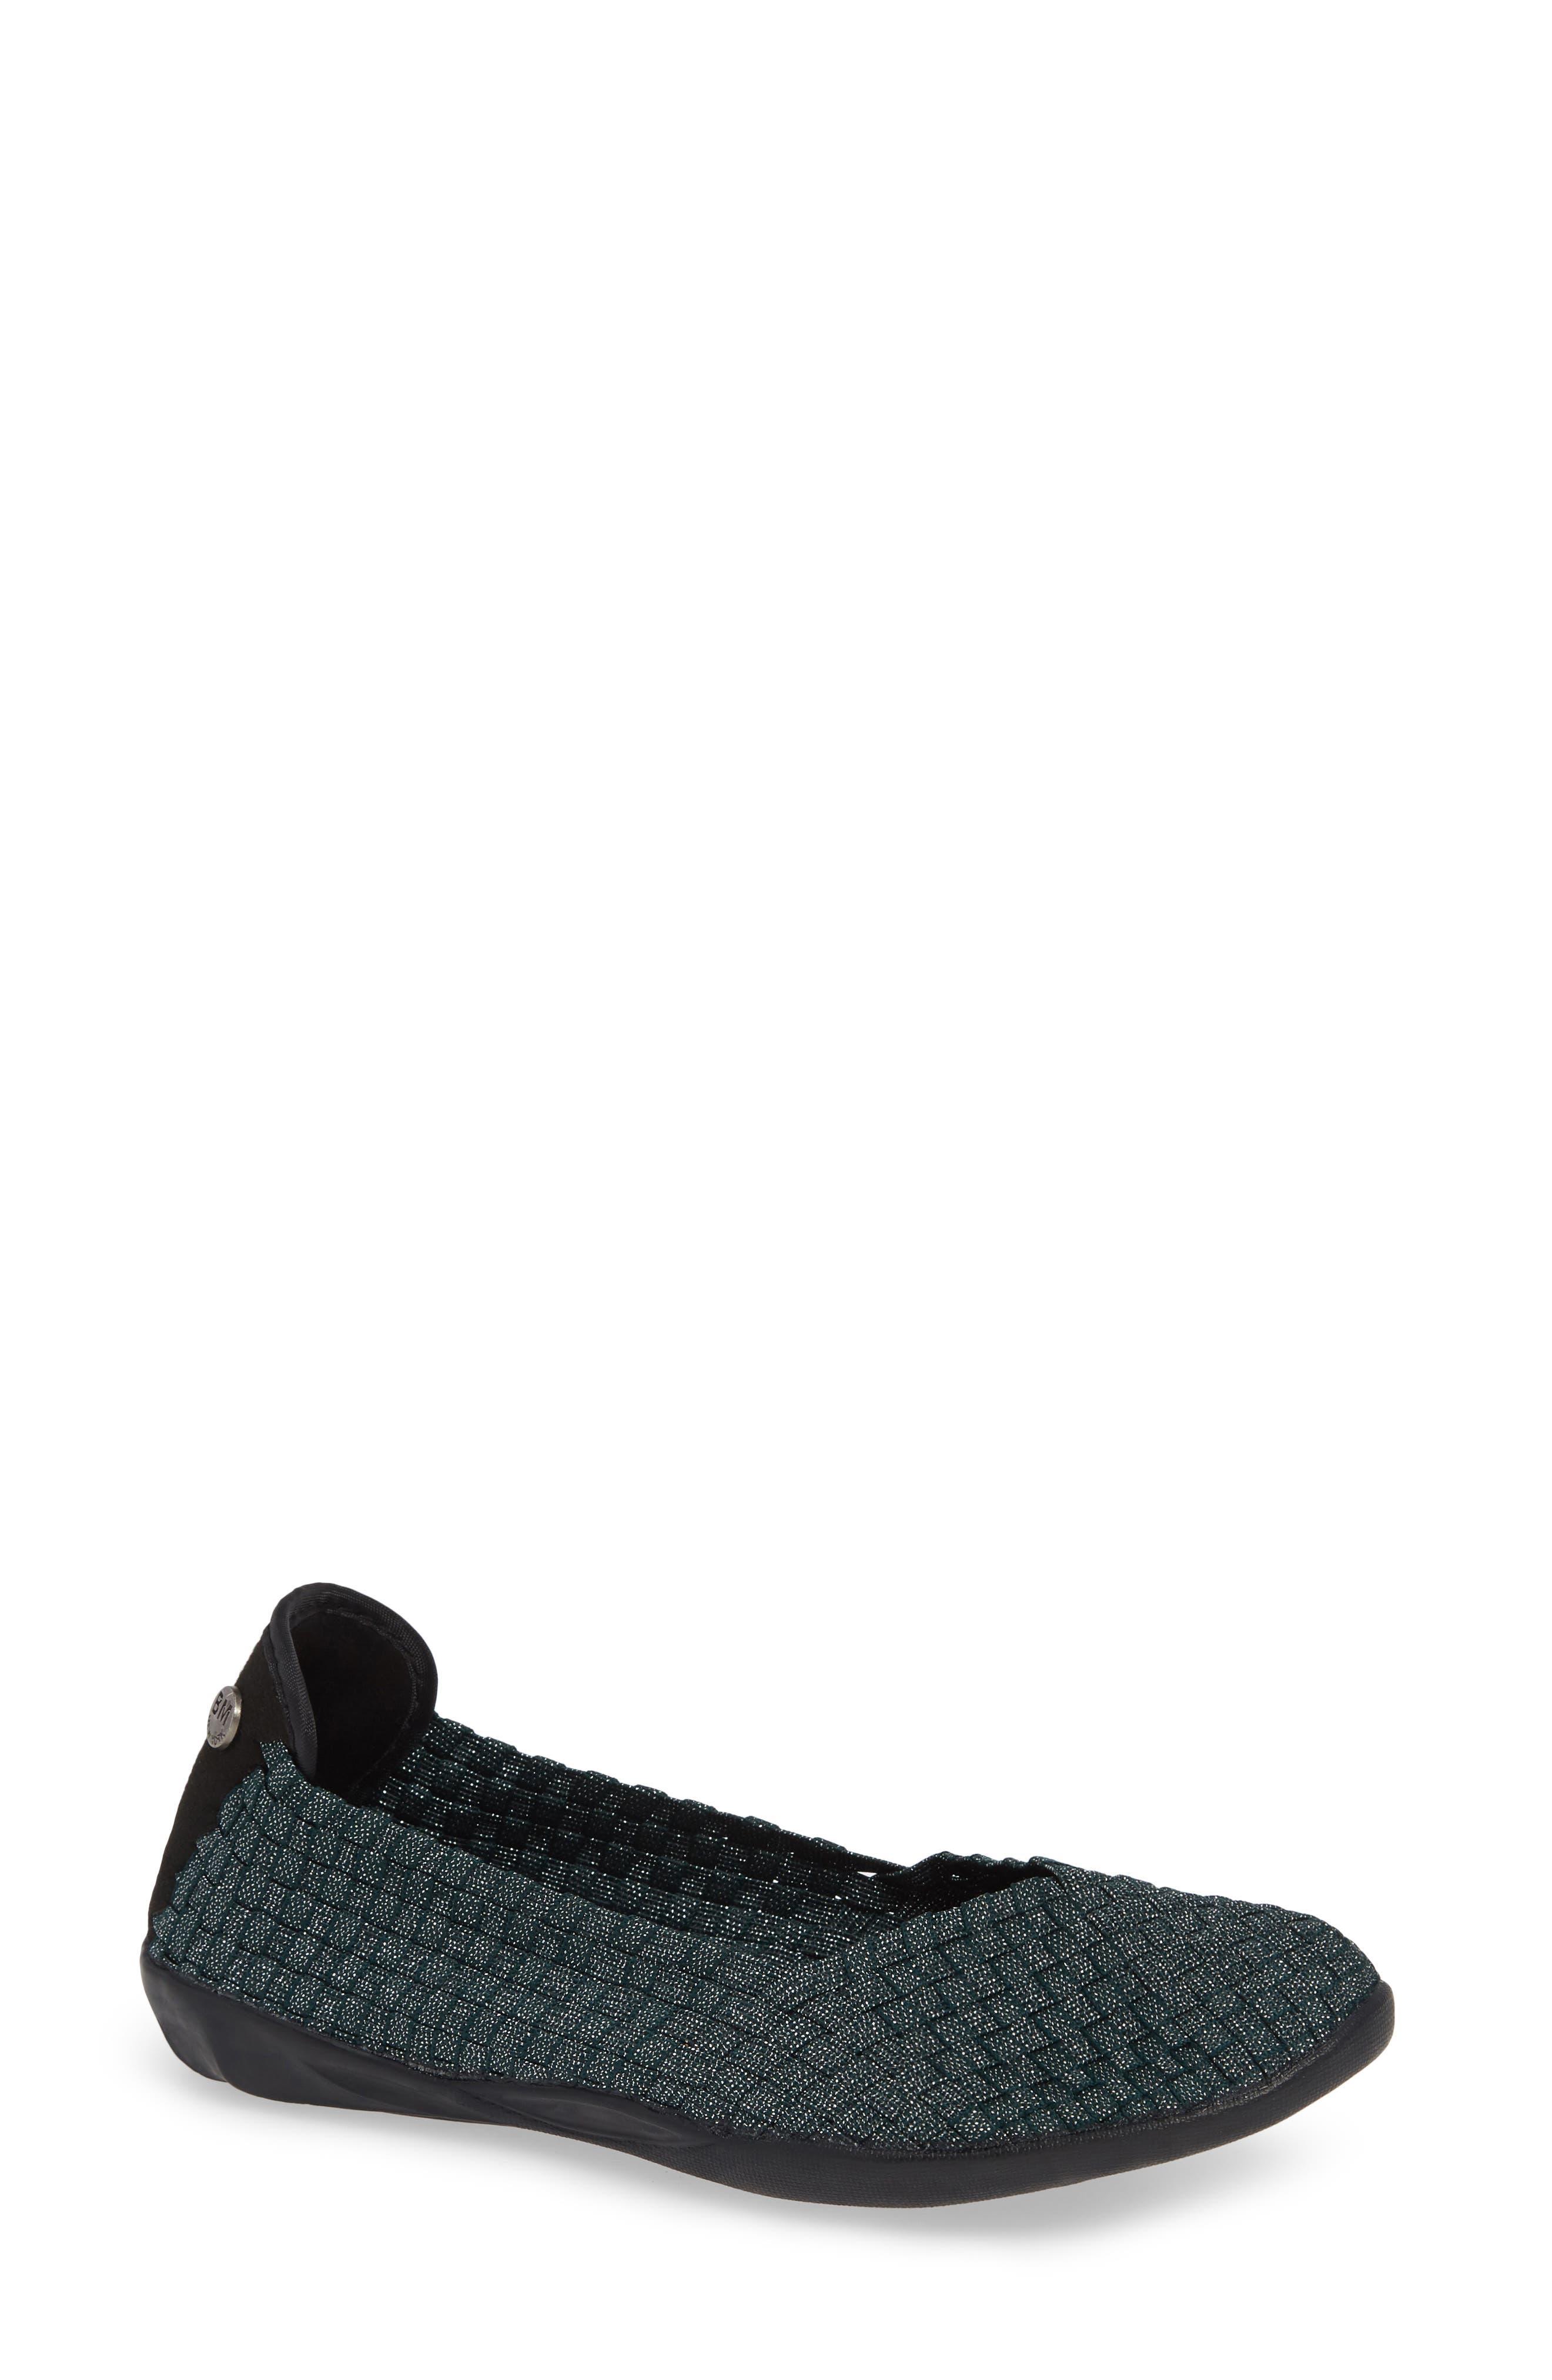 Catwalk Sneaker,                         Main,                         color, DEEP GREEN SHIMMER FABRIC